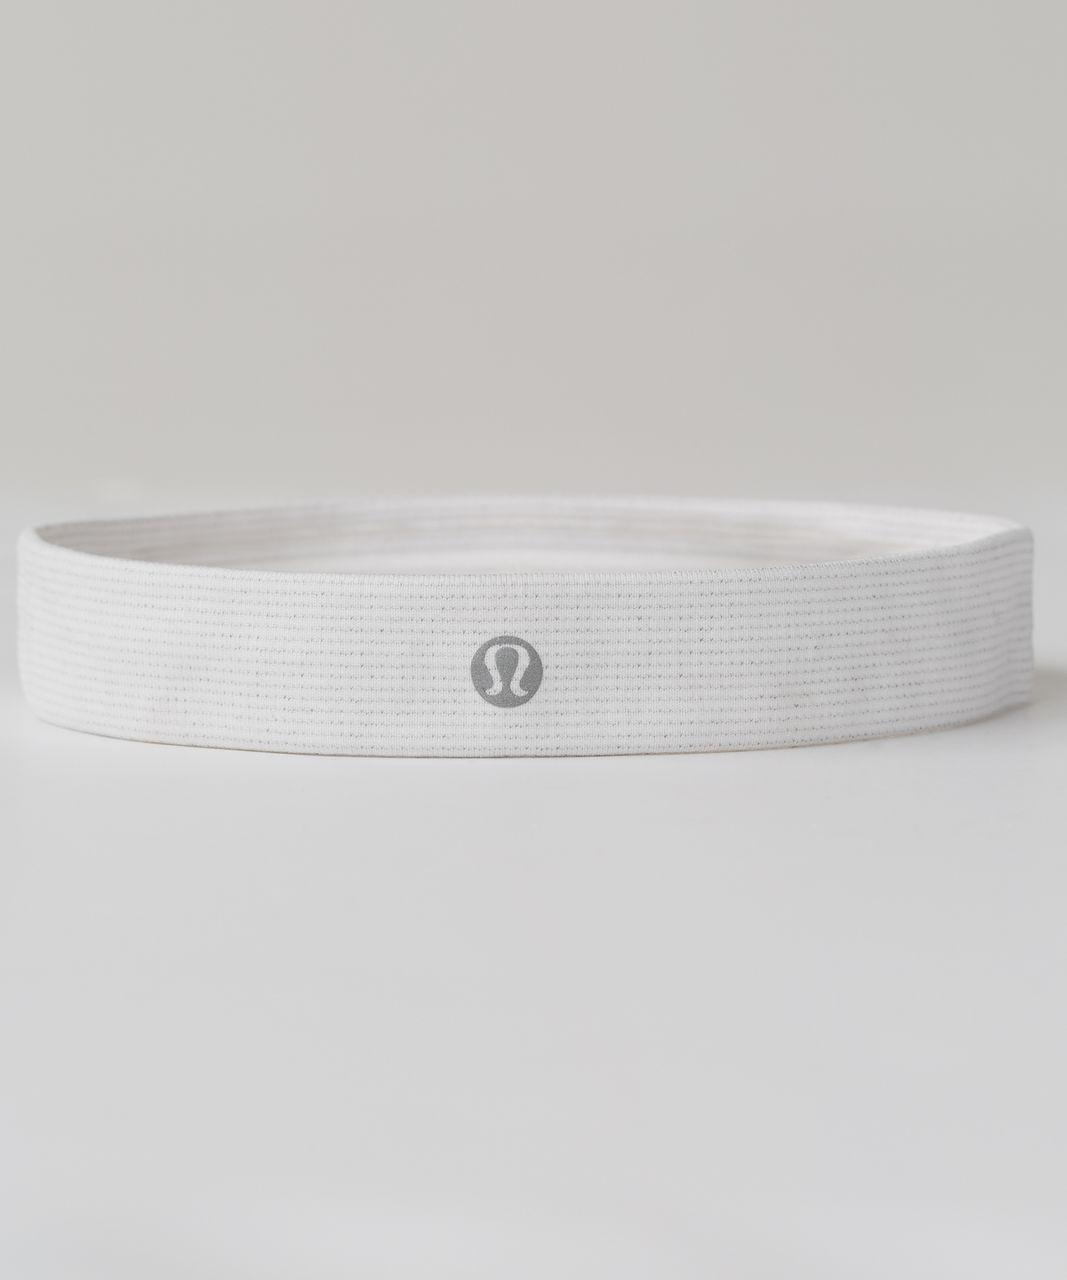 Lululemon Cardio Cross Trainer Headband - Heathered White